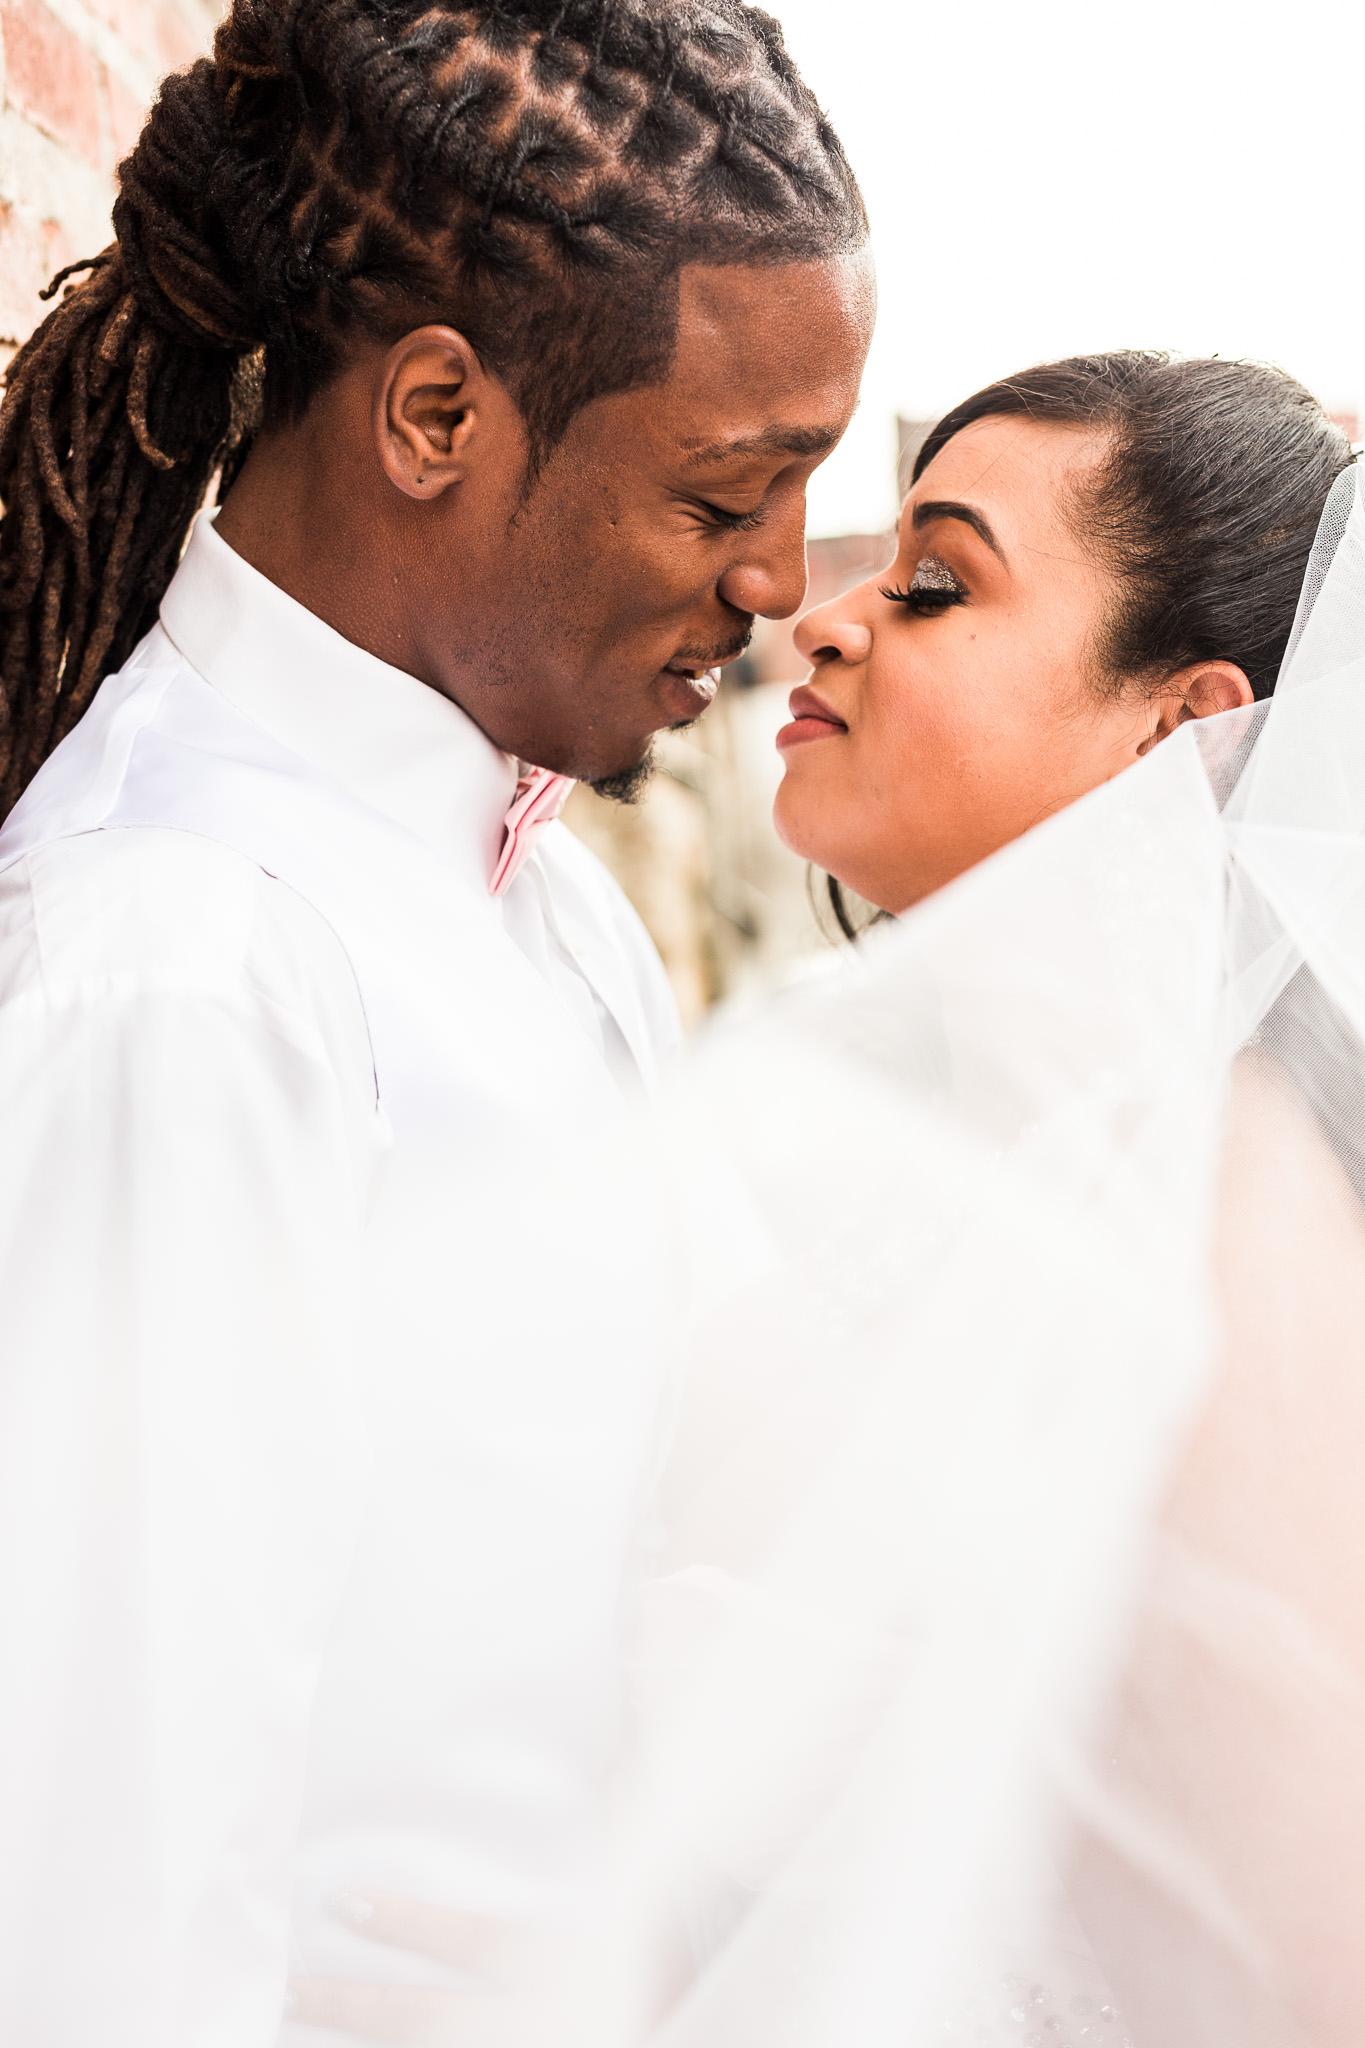 st-louis-photographer-cellar-222-wedding-14.jpg